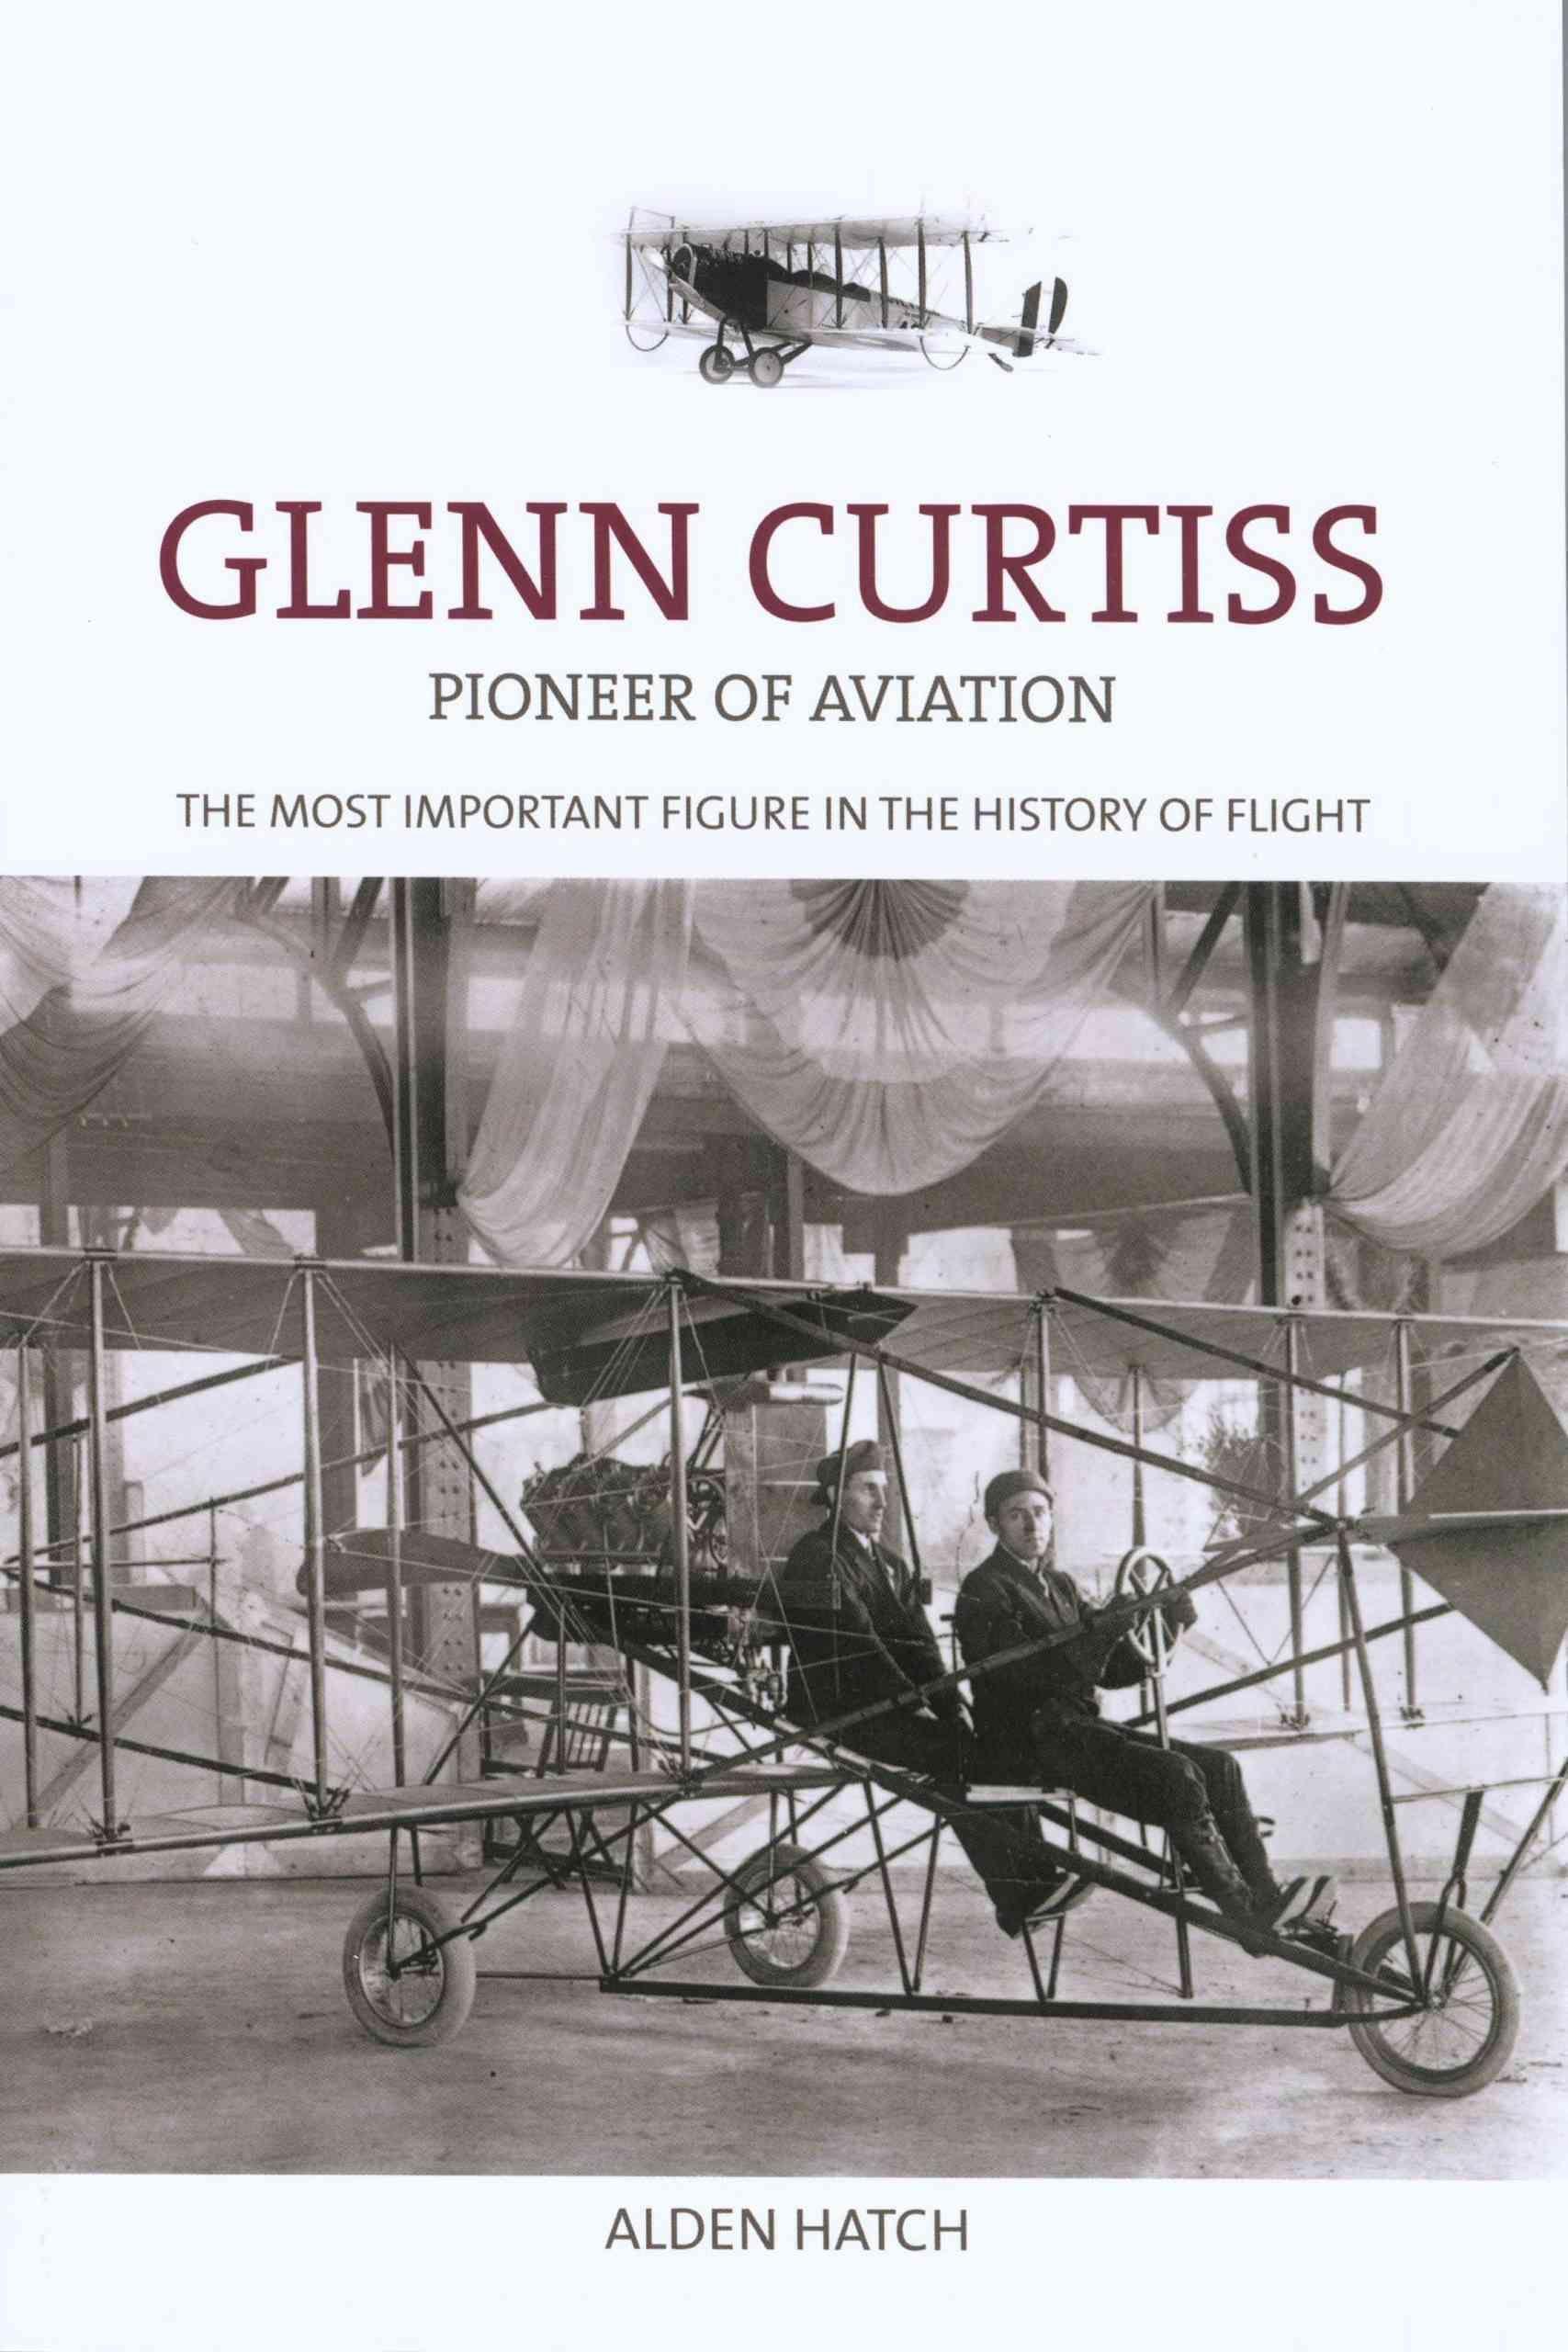 Glenn curtiss pioneer of aviation glenn curtiss